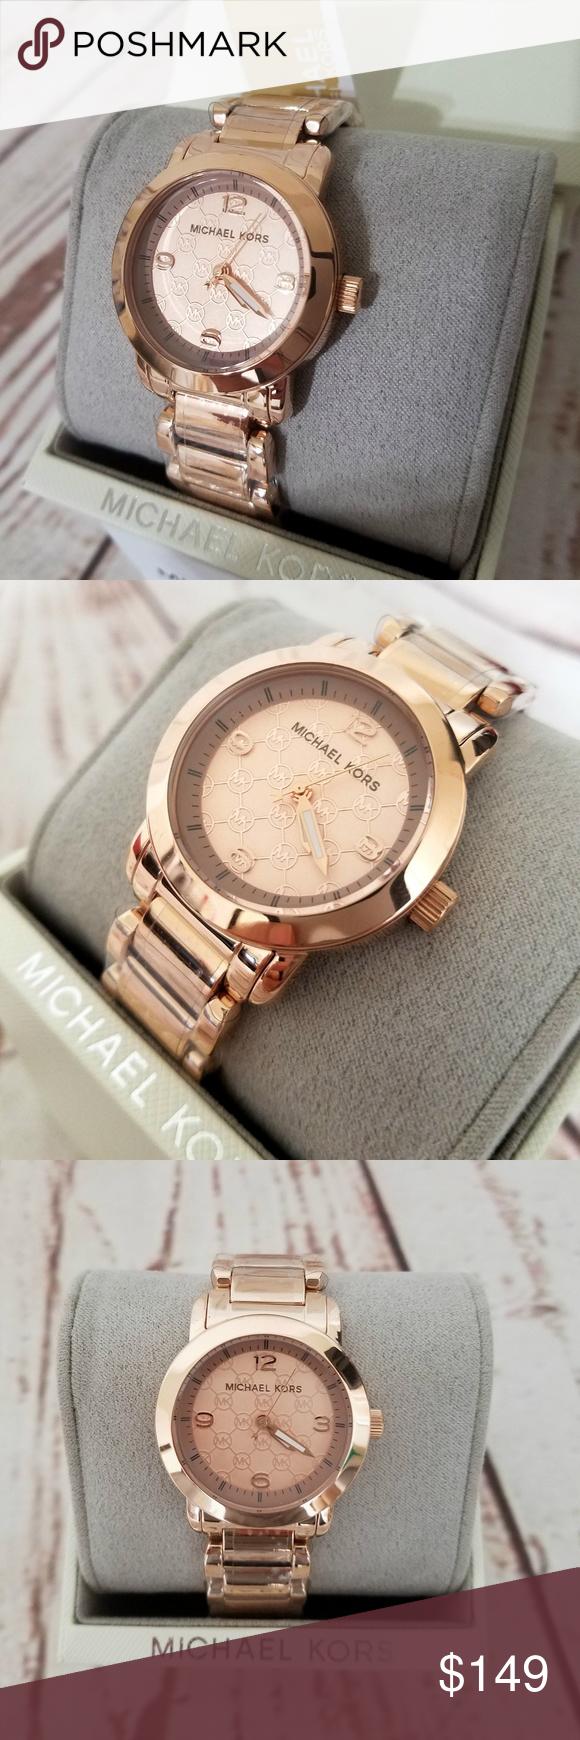 451081f49f5b Michael Kors Rose Gold-Tone Three-Hand Watch MK315    100 ...